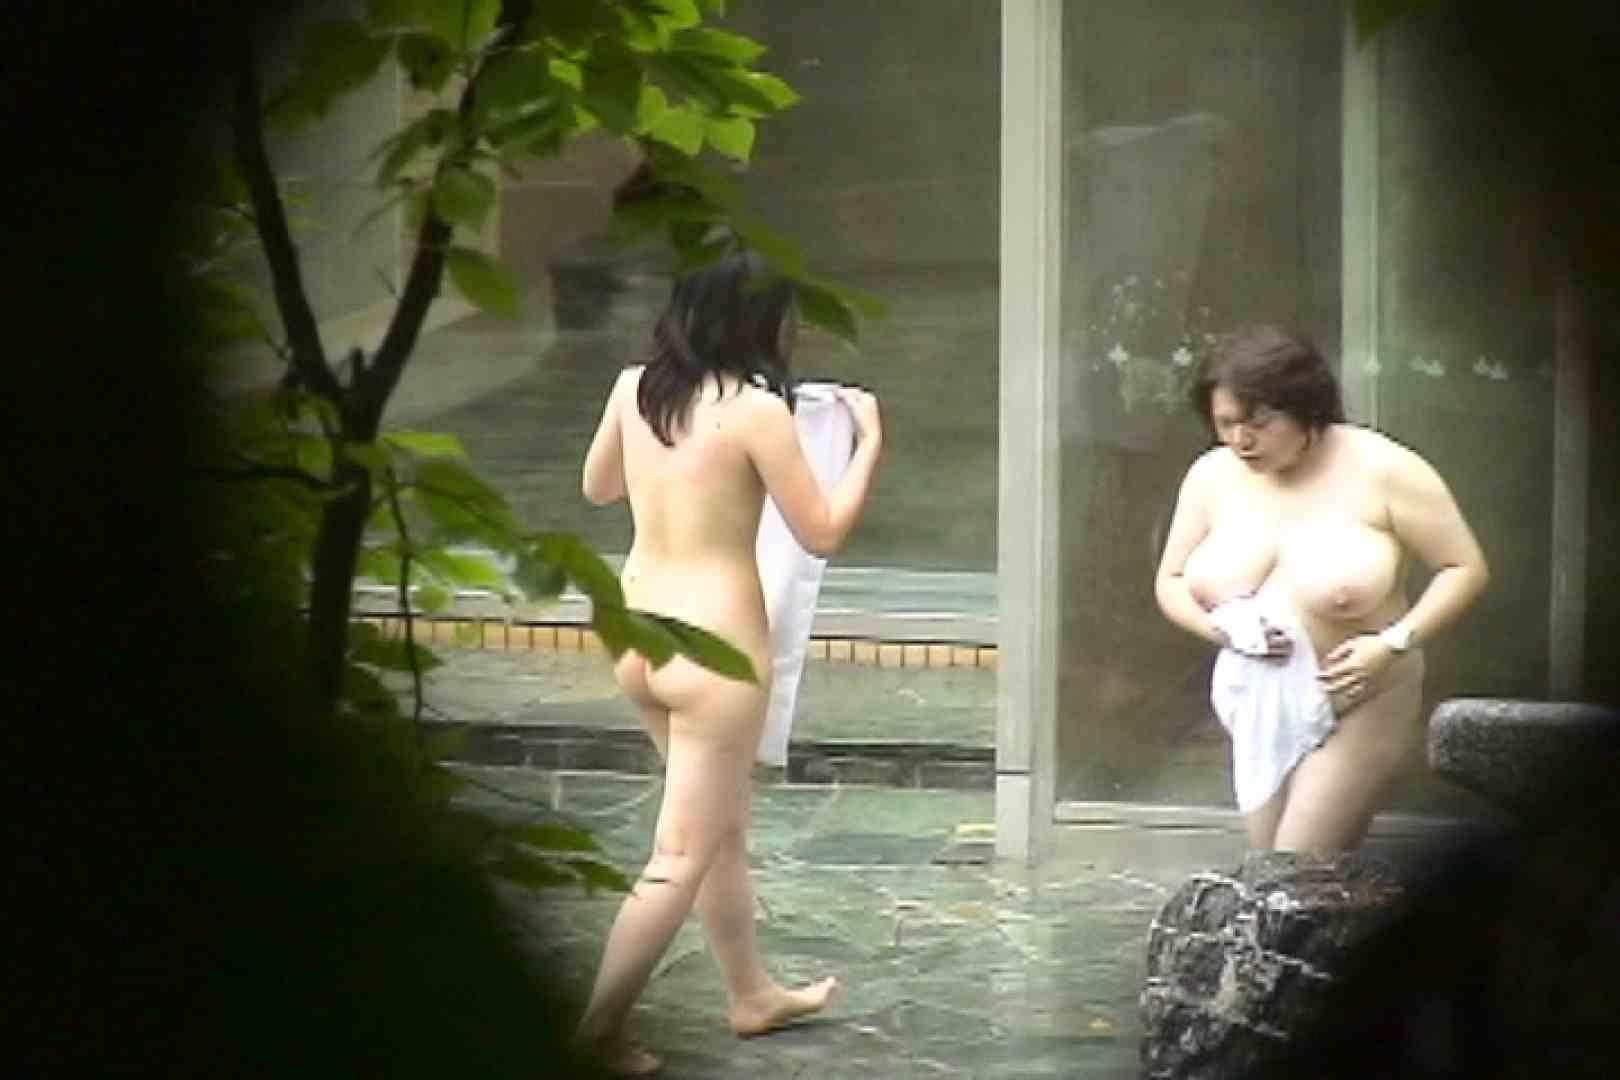 Aquaな露天風呂Vol.711 露天風呂突入 おまんこ無修正動画無料 97pic 11